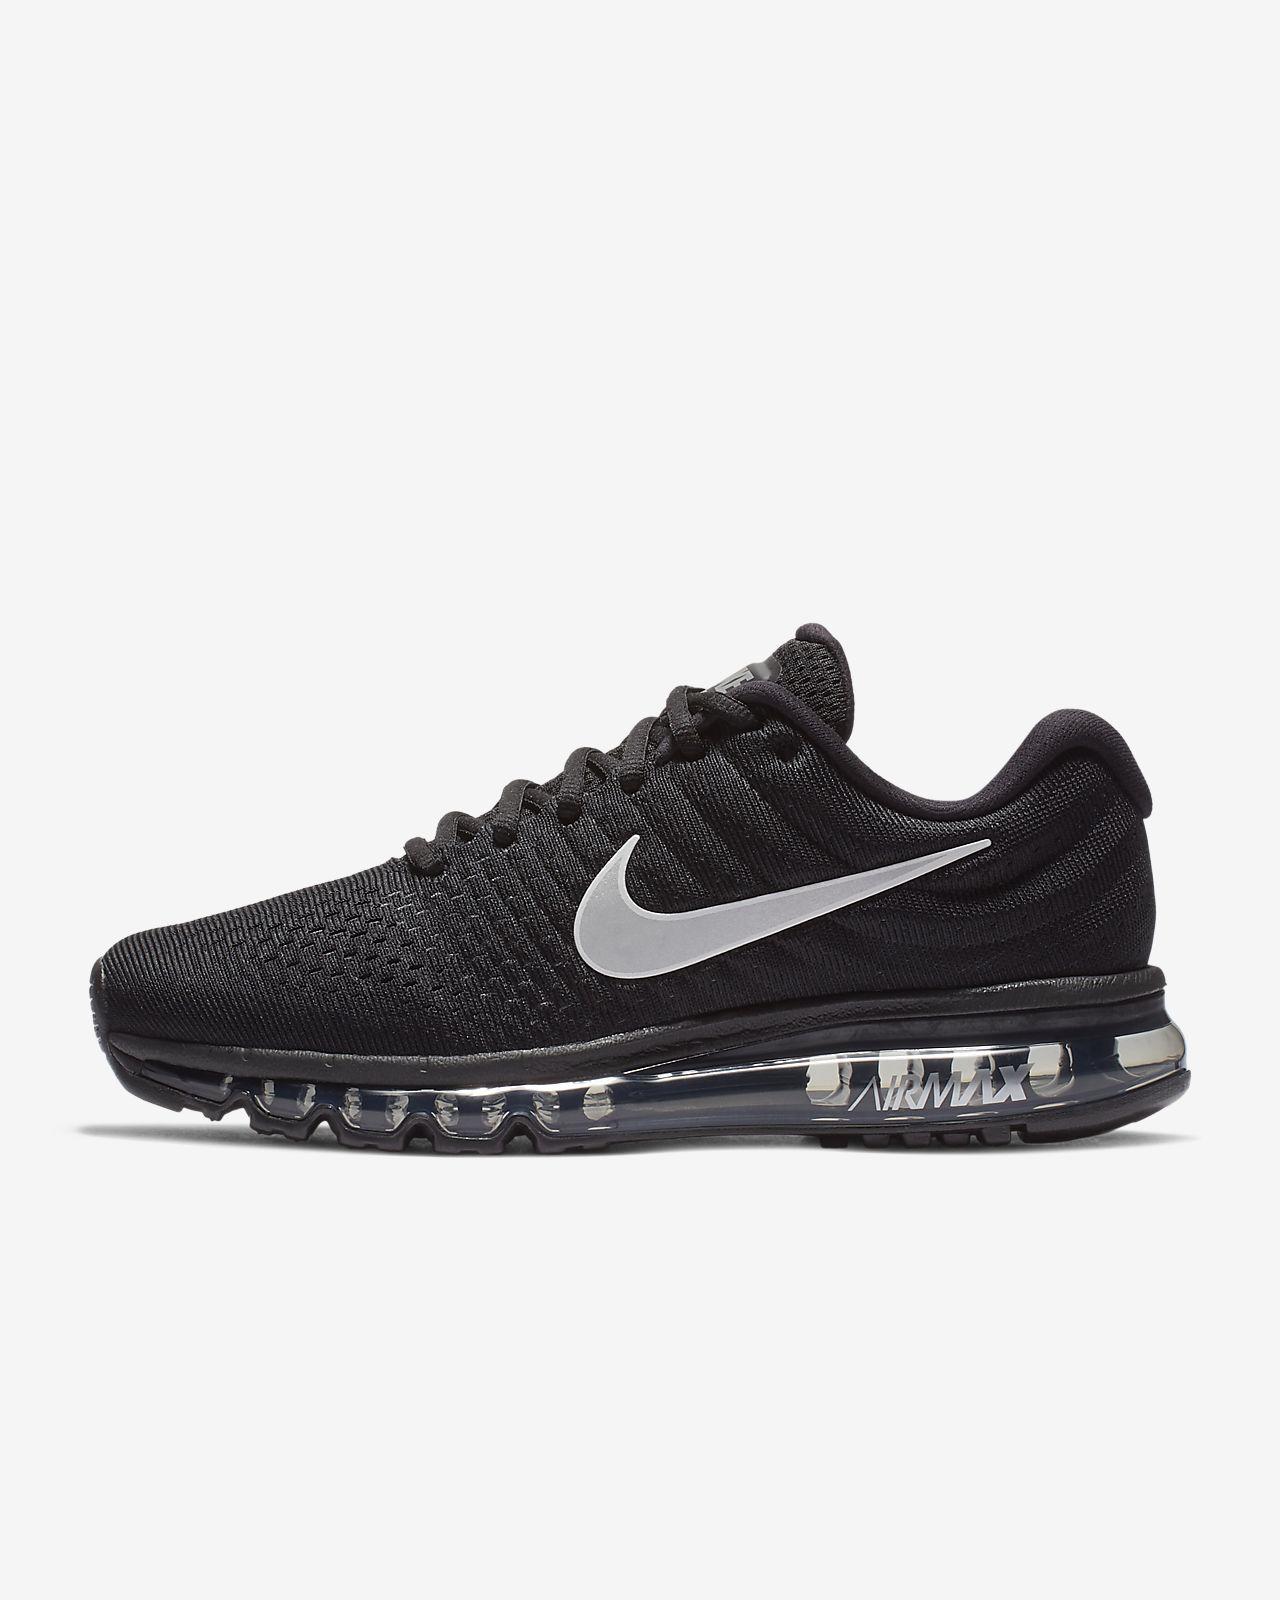 outlet store 4ec17 cbb4b ... Chaussure Nike Air Max 2017 pour Homme